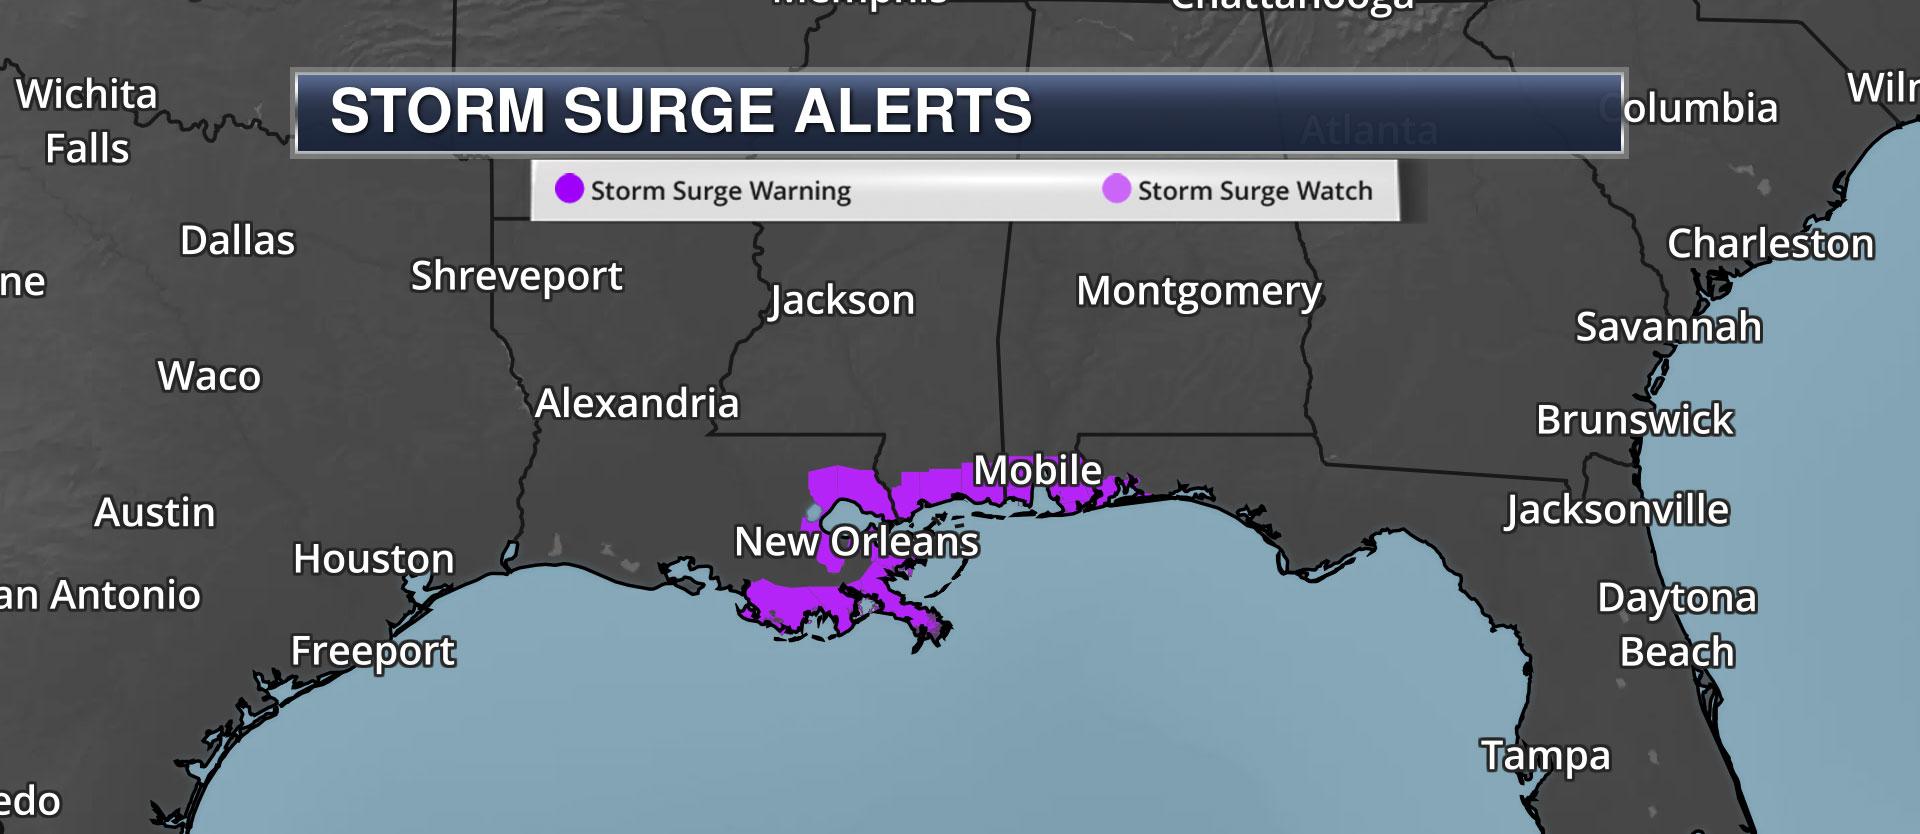 storm-surge-alerts-10.29-radar